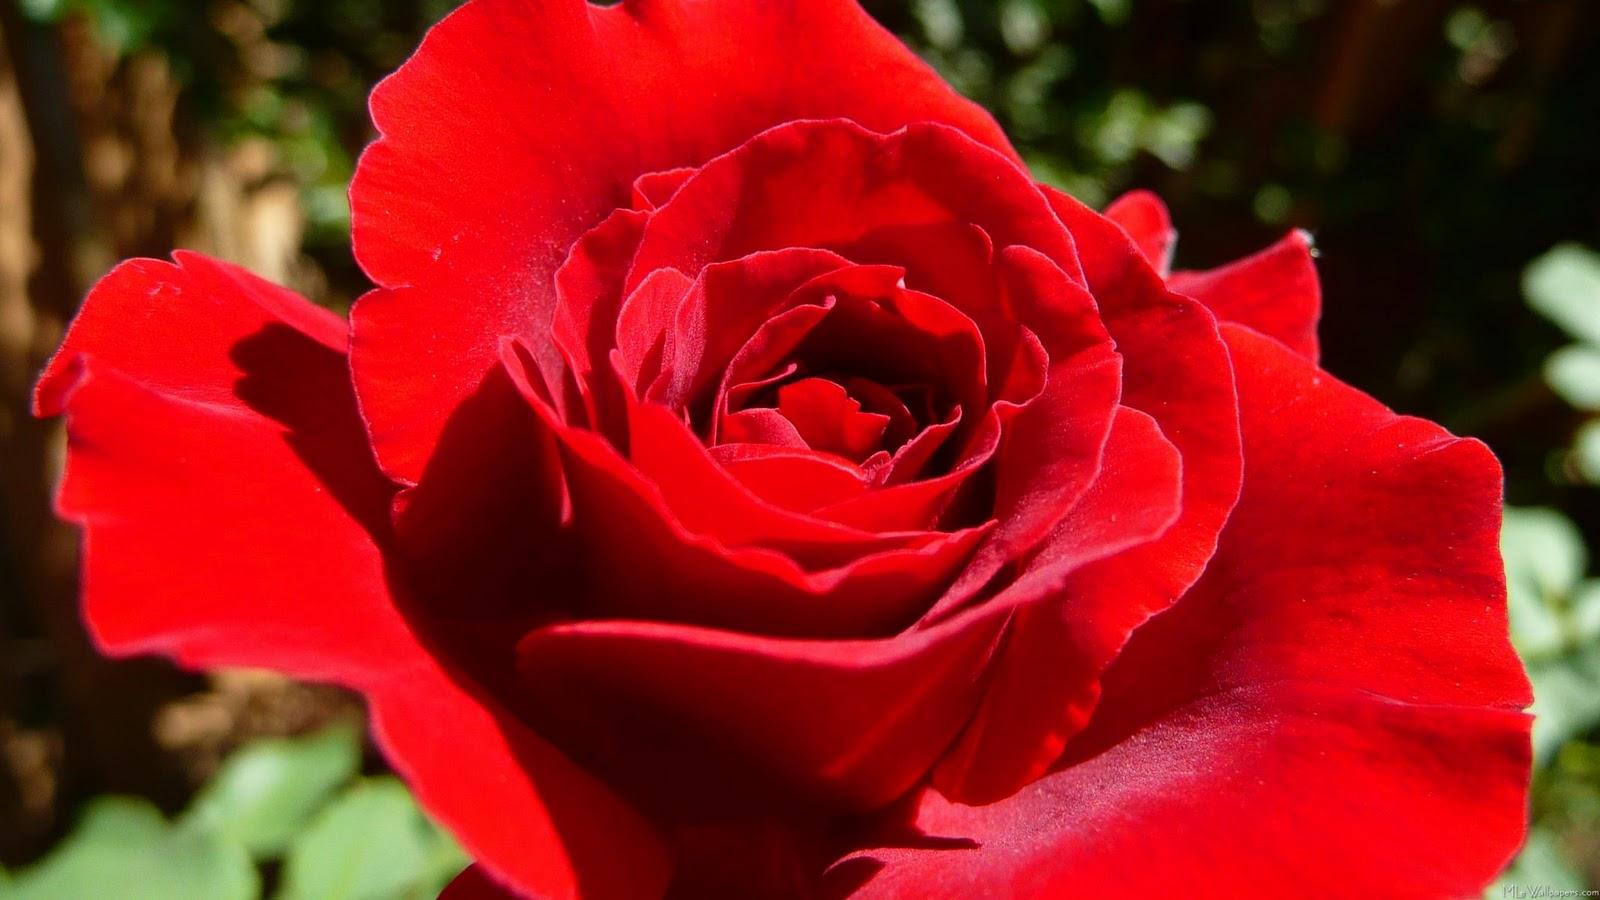 17 beautiful red rose - photo #22